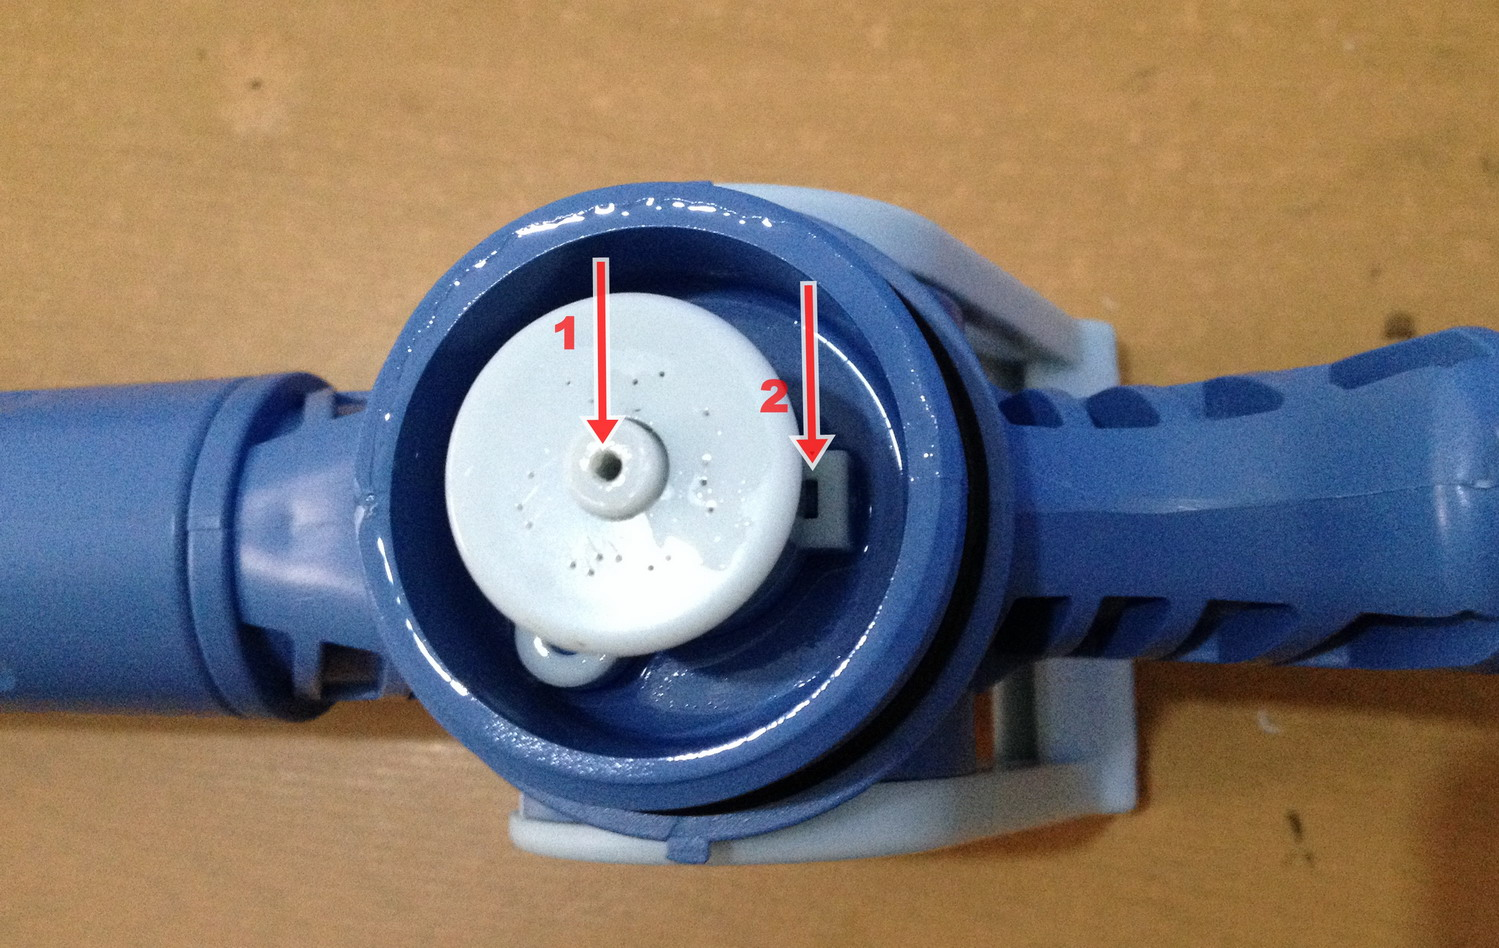 Toko Ez Jet Water Cannon Jogja Jual 8 Spray Pressure Wireless Glamgorgeous